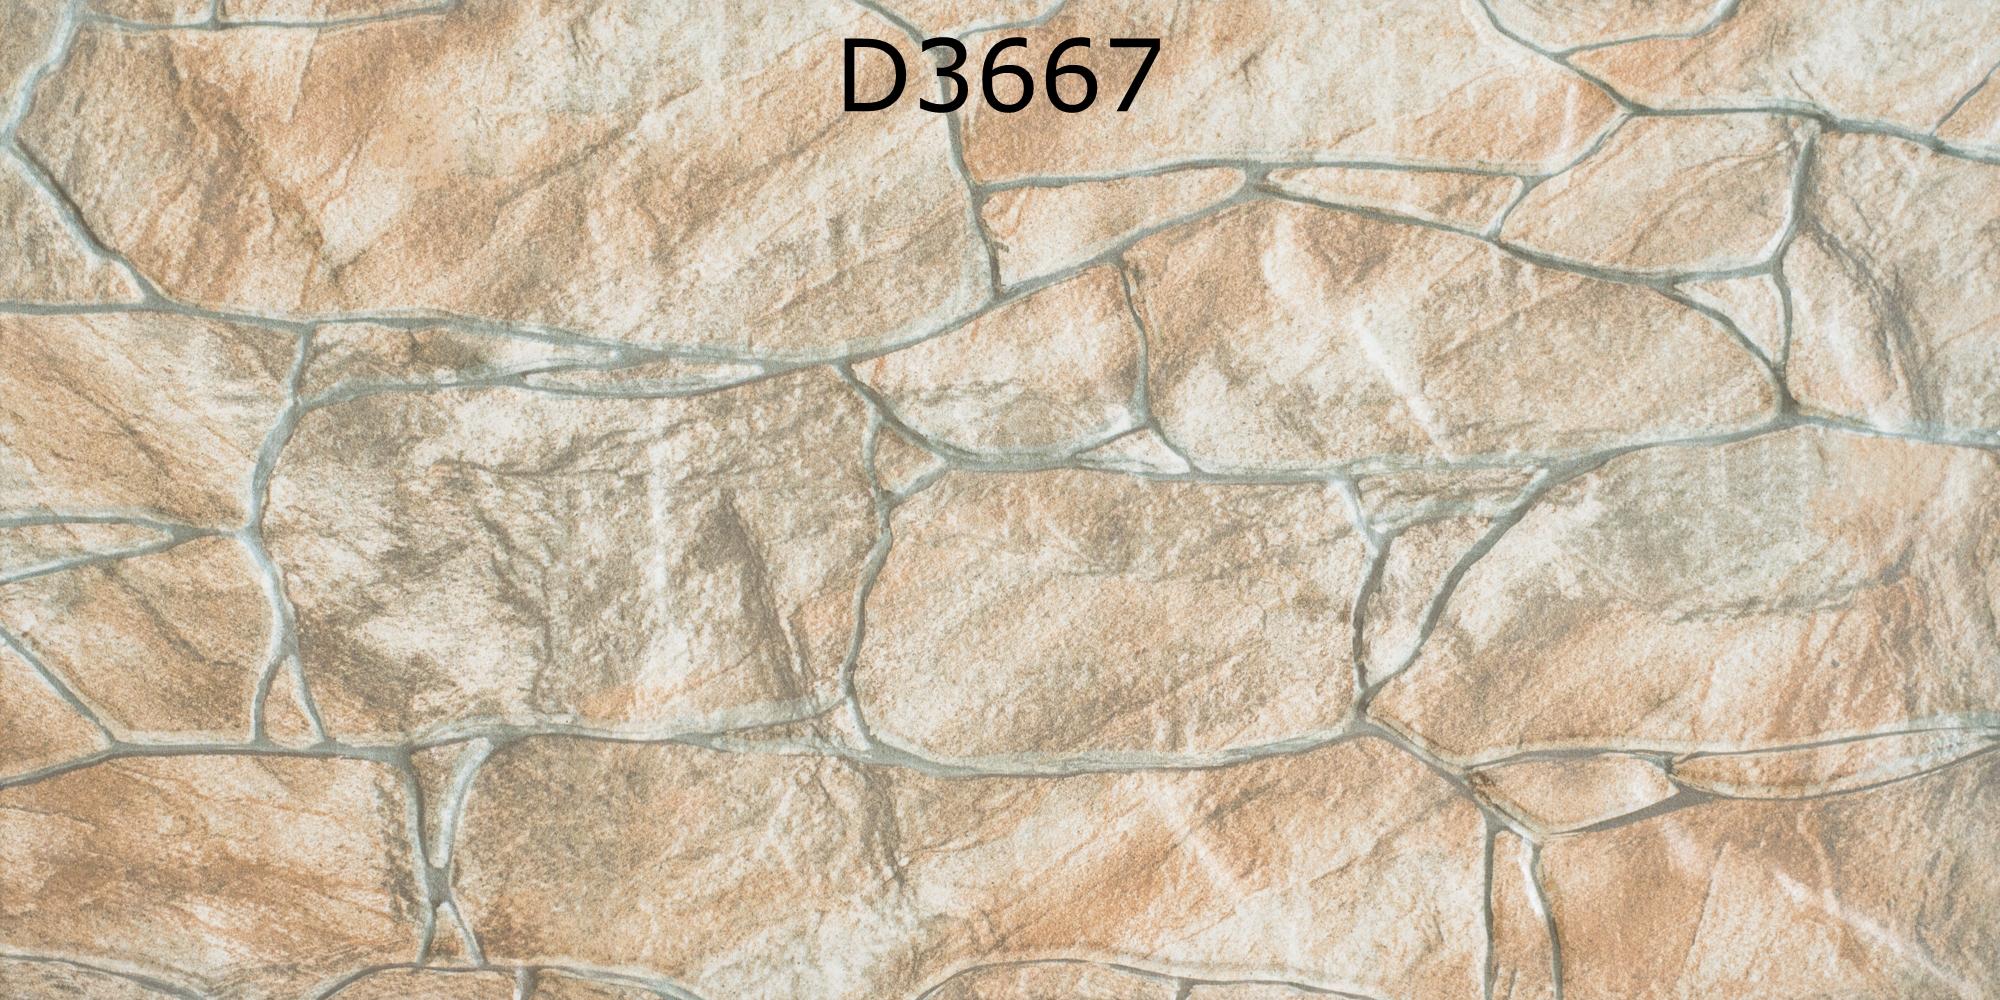 D3667